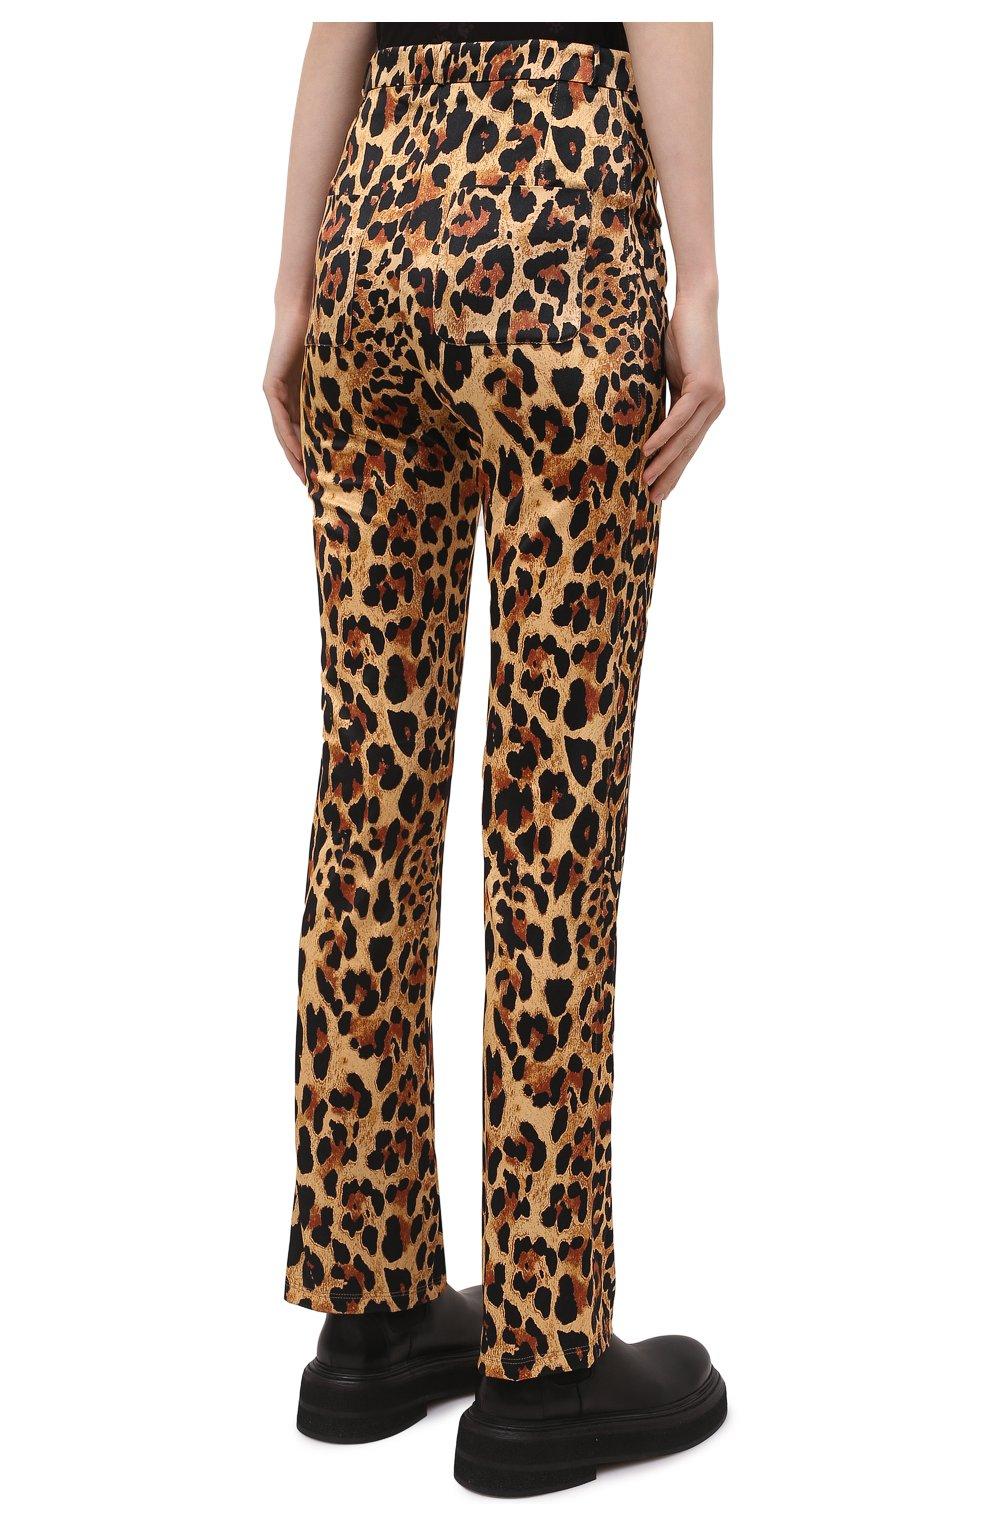 Женские брюки из вискозы PACO RABANNE леопардового цвета, арт. 21EJPA122VI0231 | Фото 4